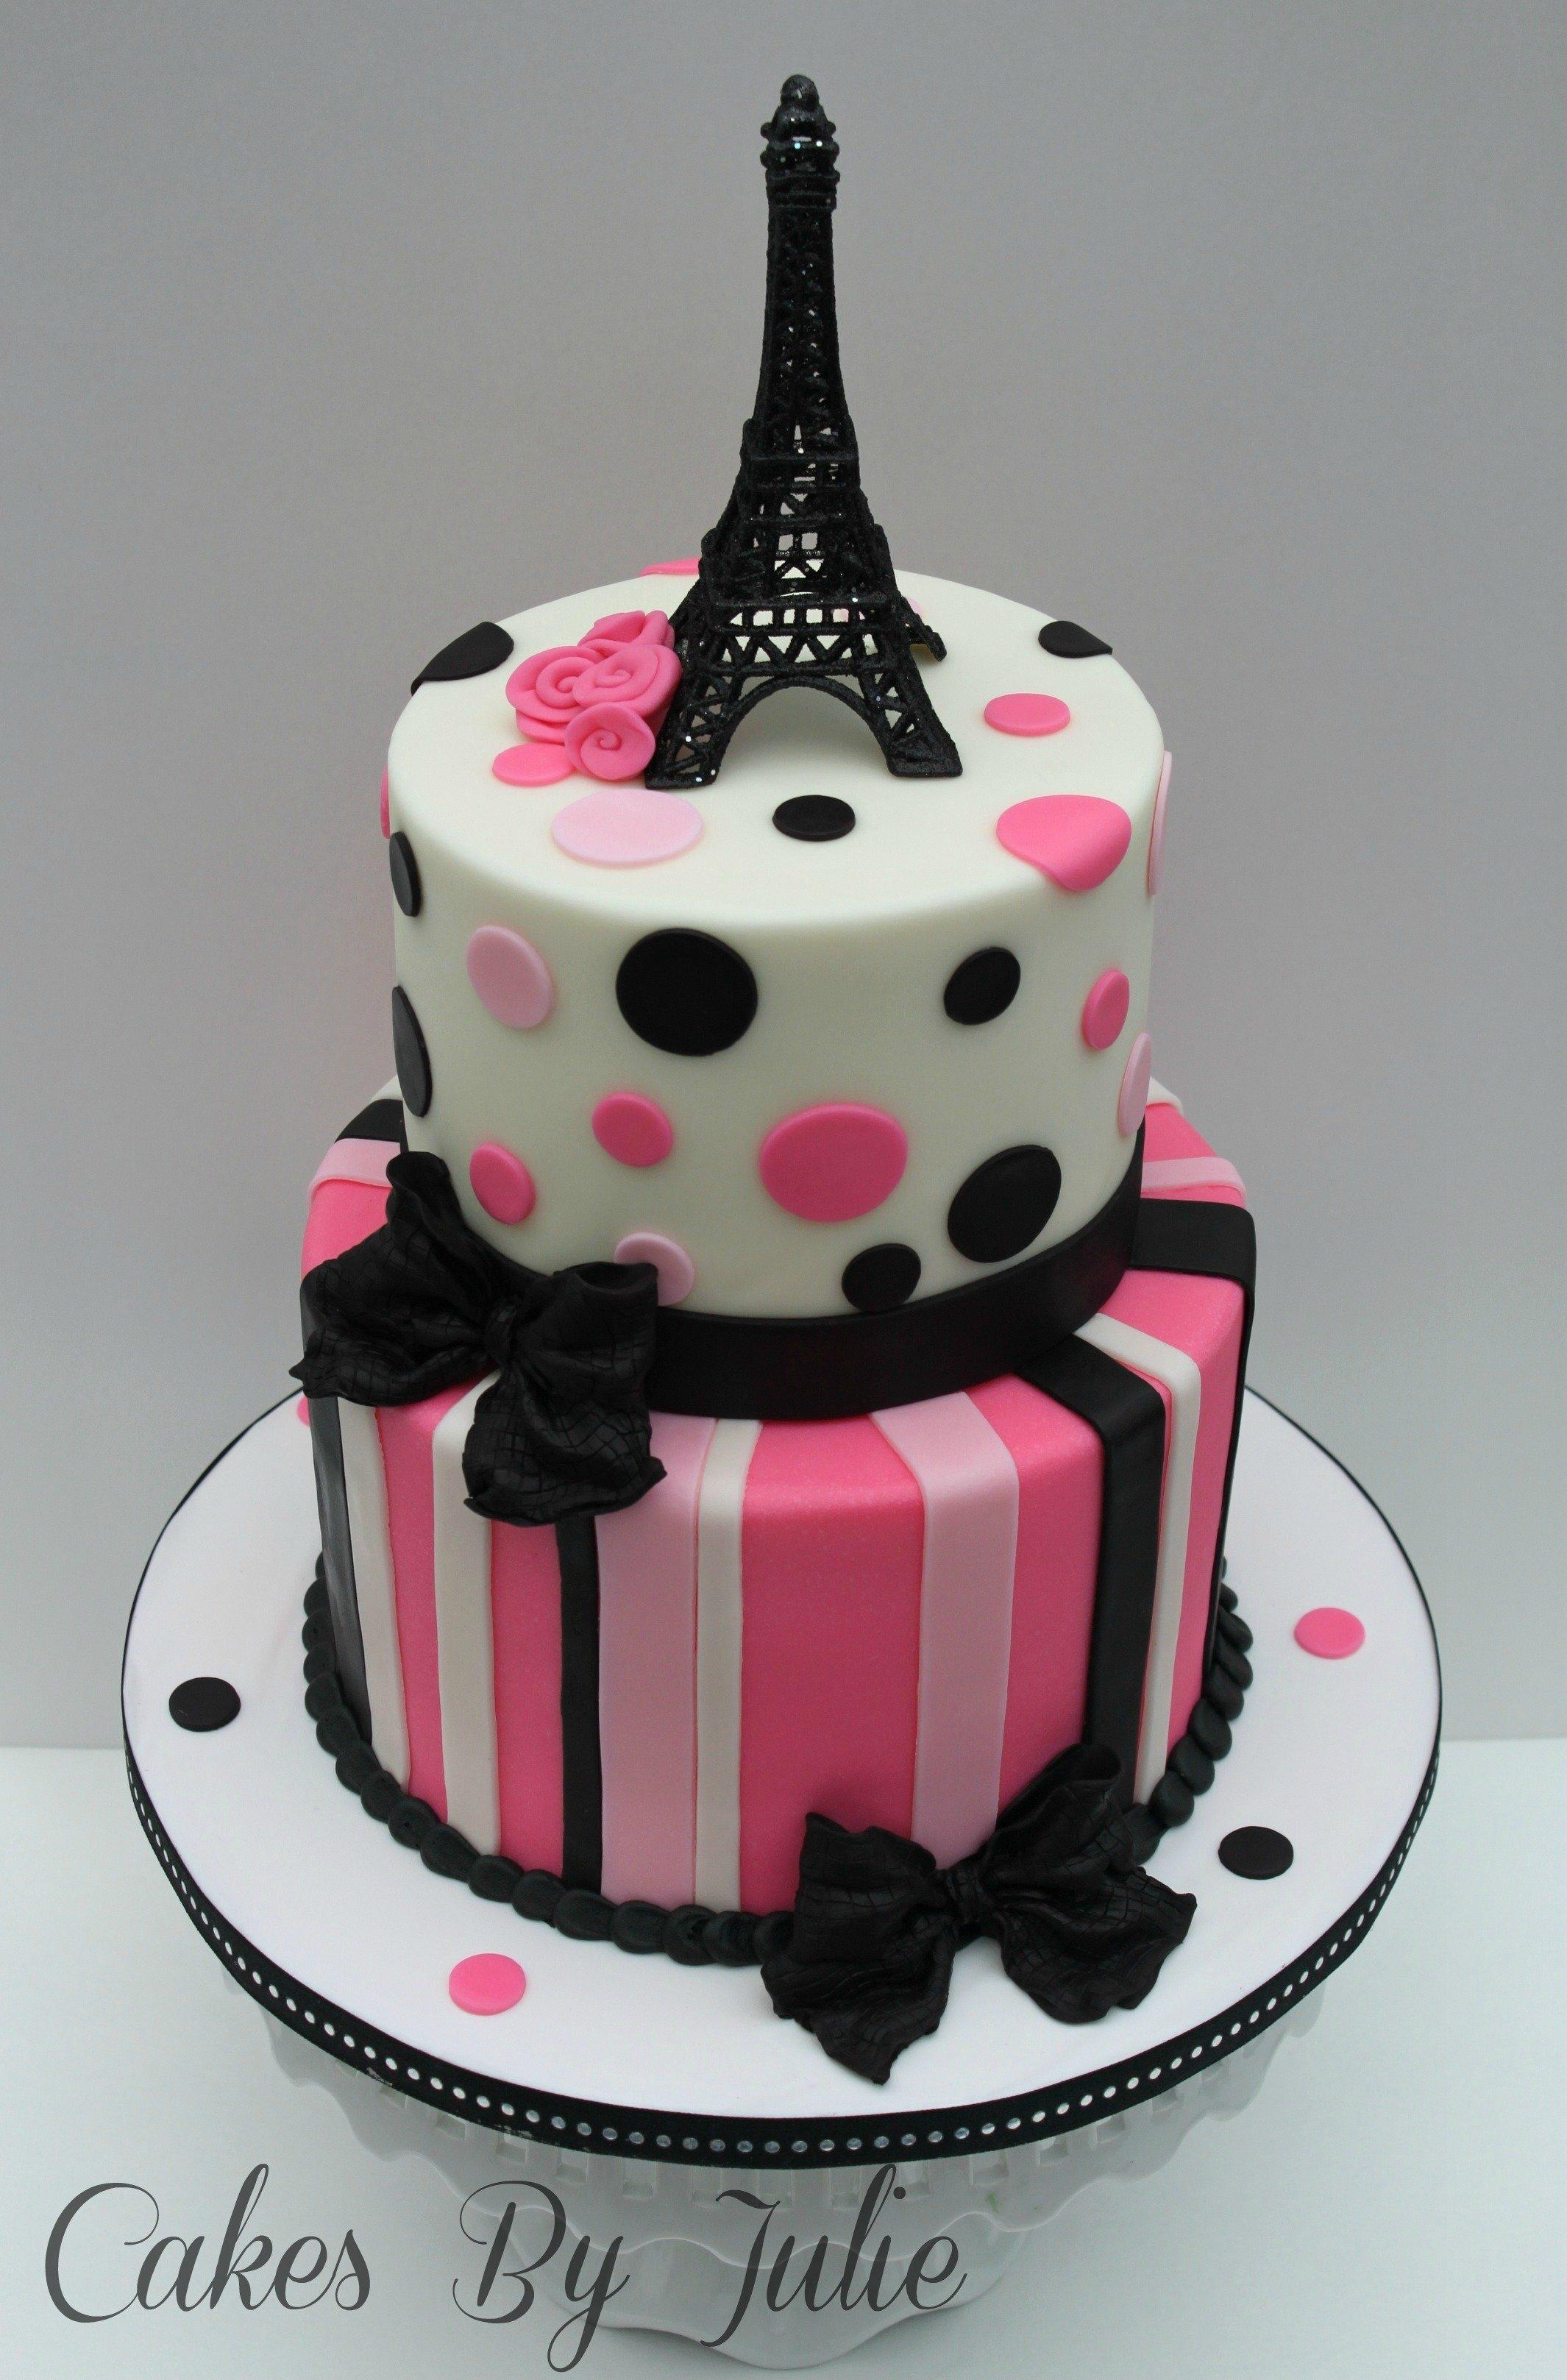 10 Pretty Birthday Cake Ideas For Girls birthday cakes images amazing girl birthday cakes gallery boys 2021